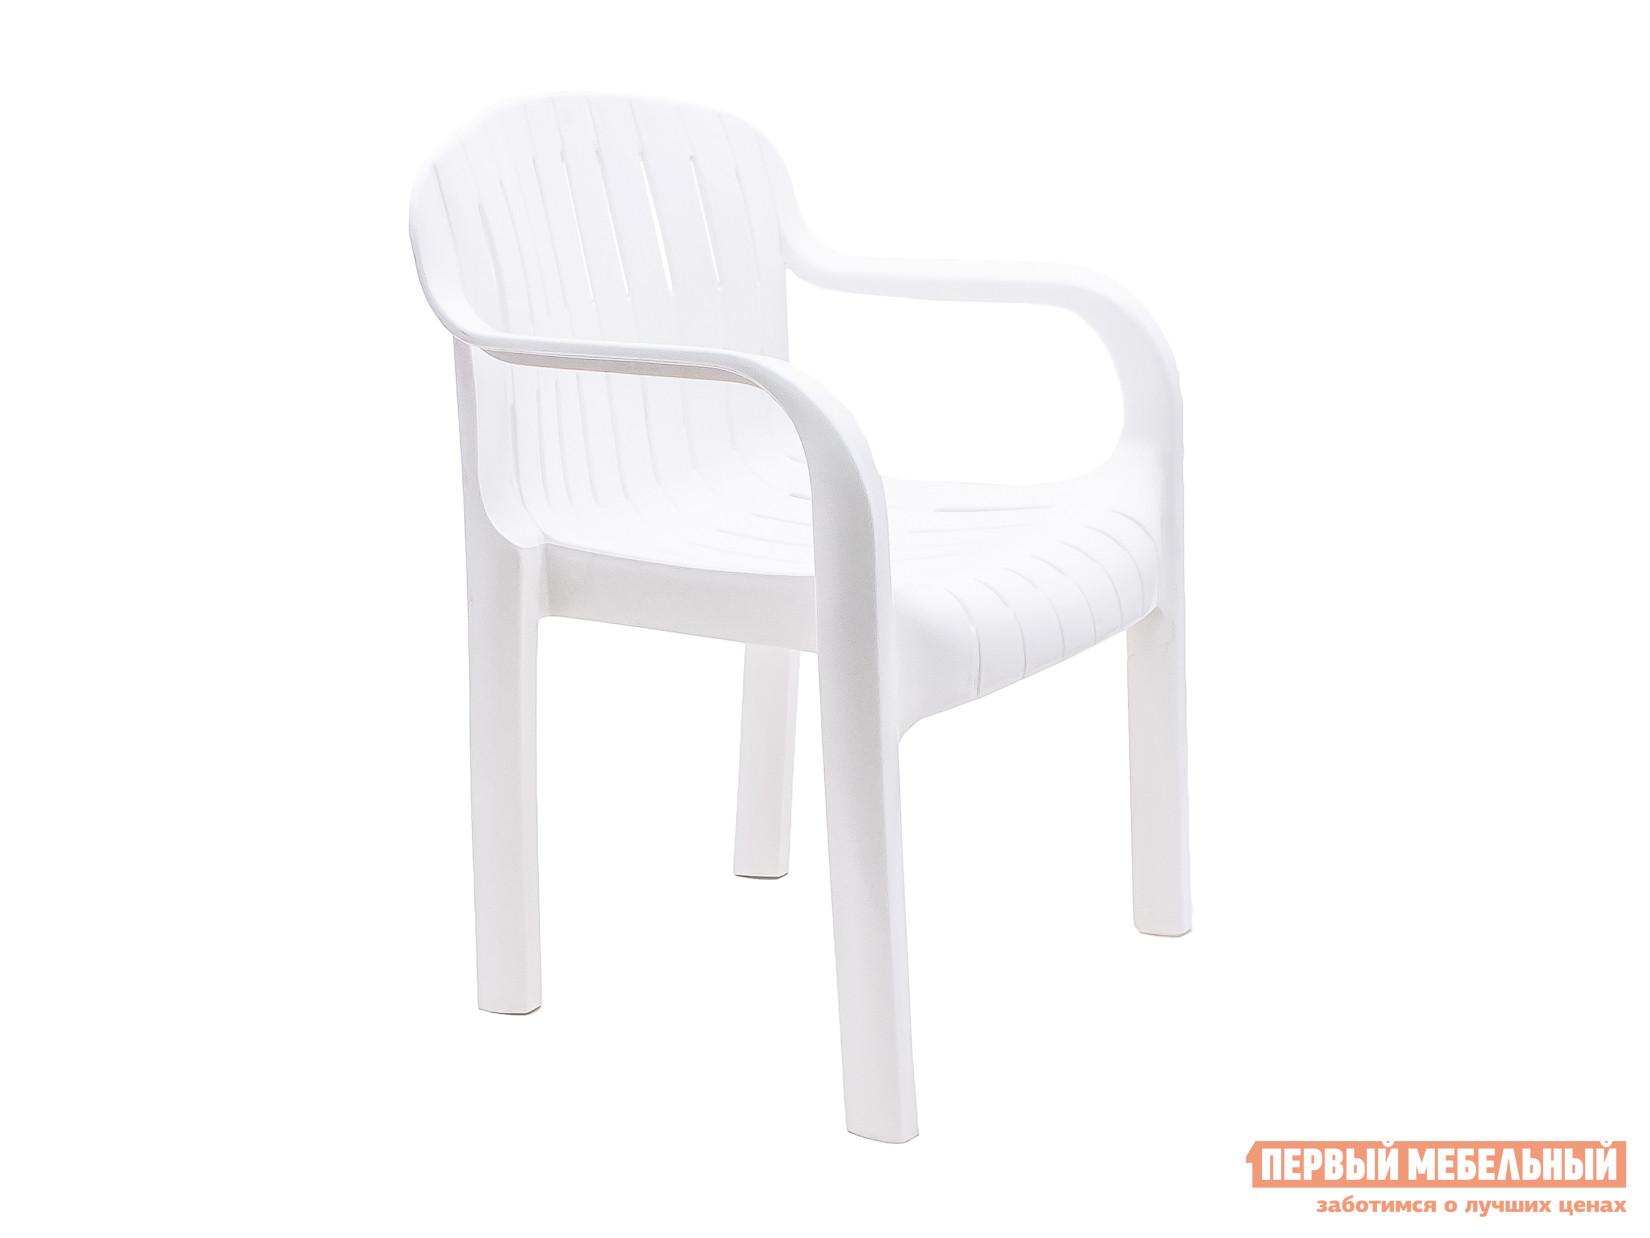 Пластиковый стул Стандарт Пластик Кресло №4 «Летнее» (610х480х810)мм Белый